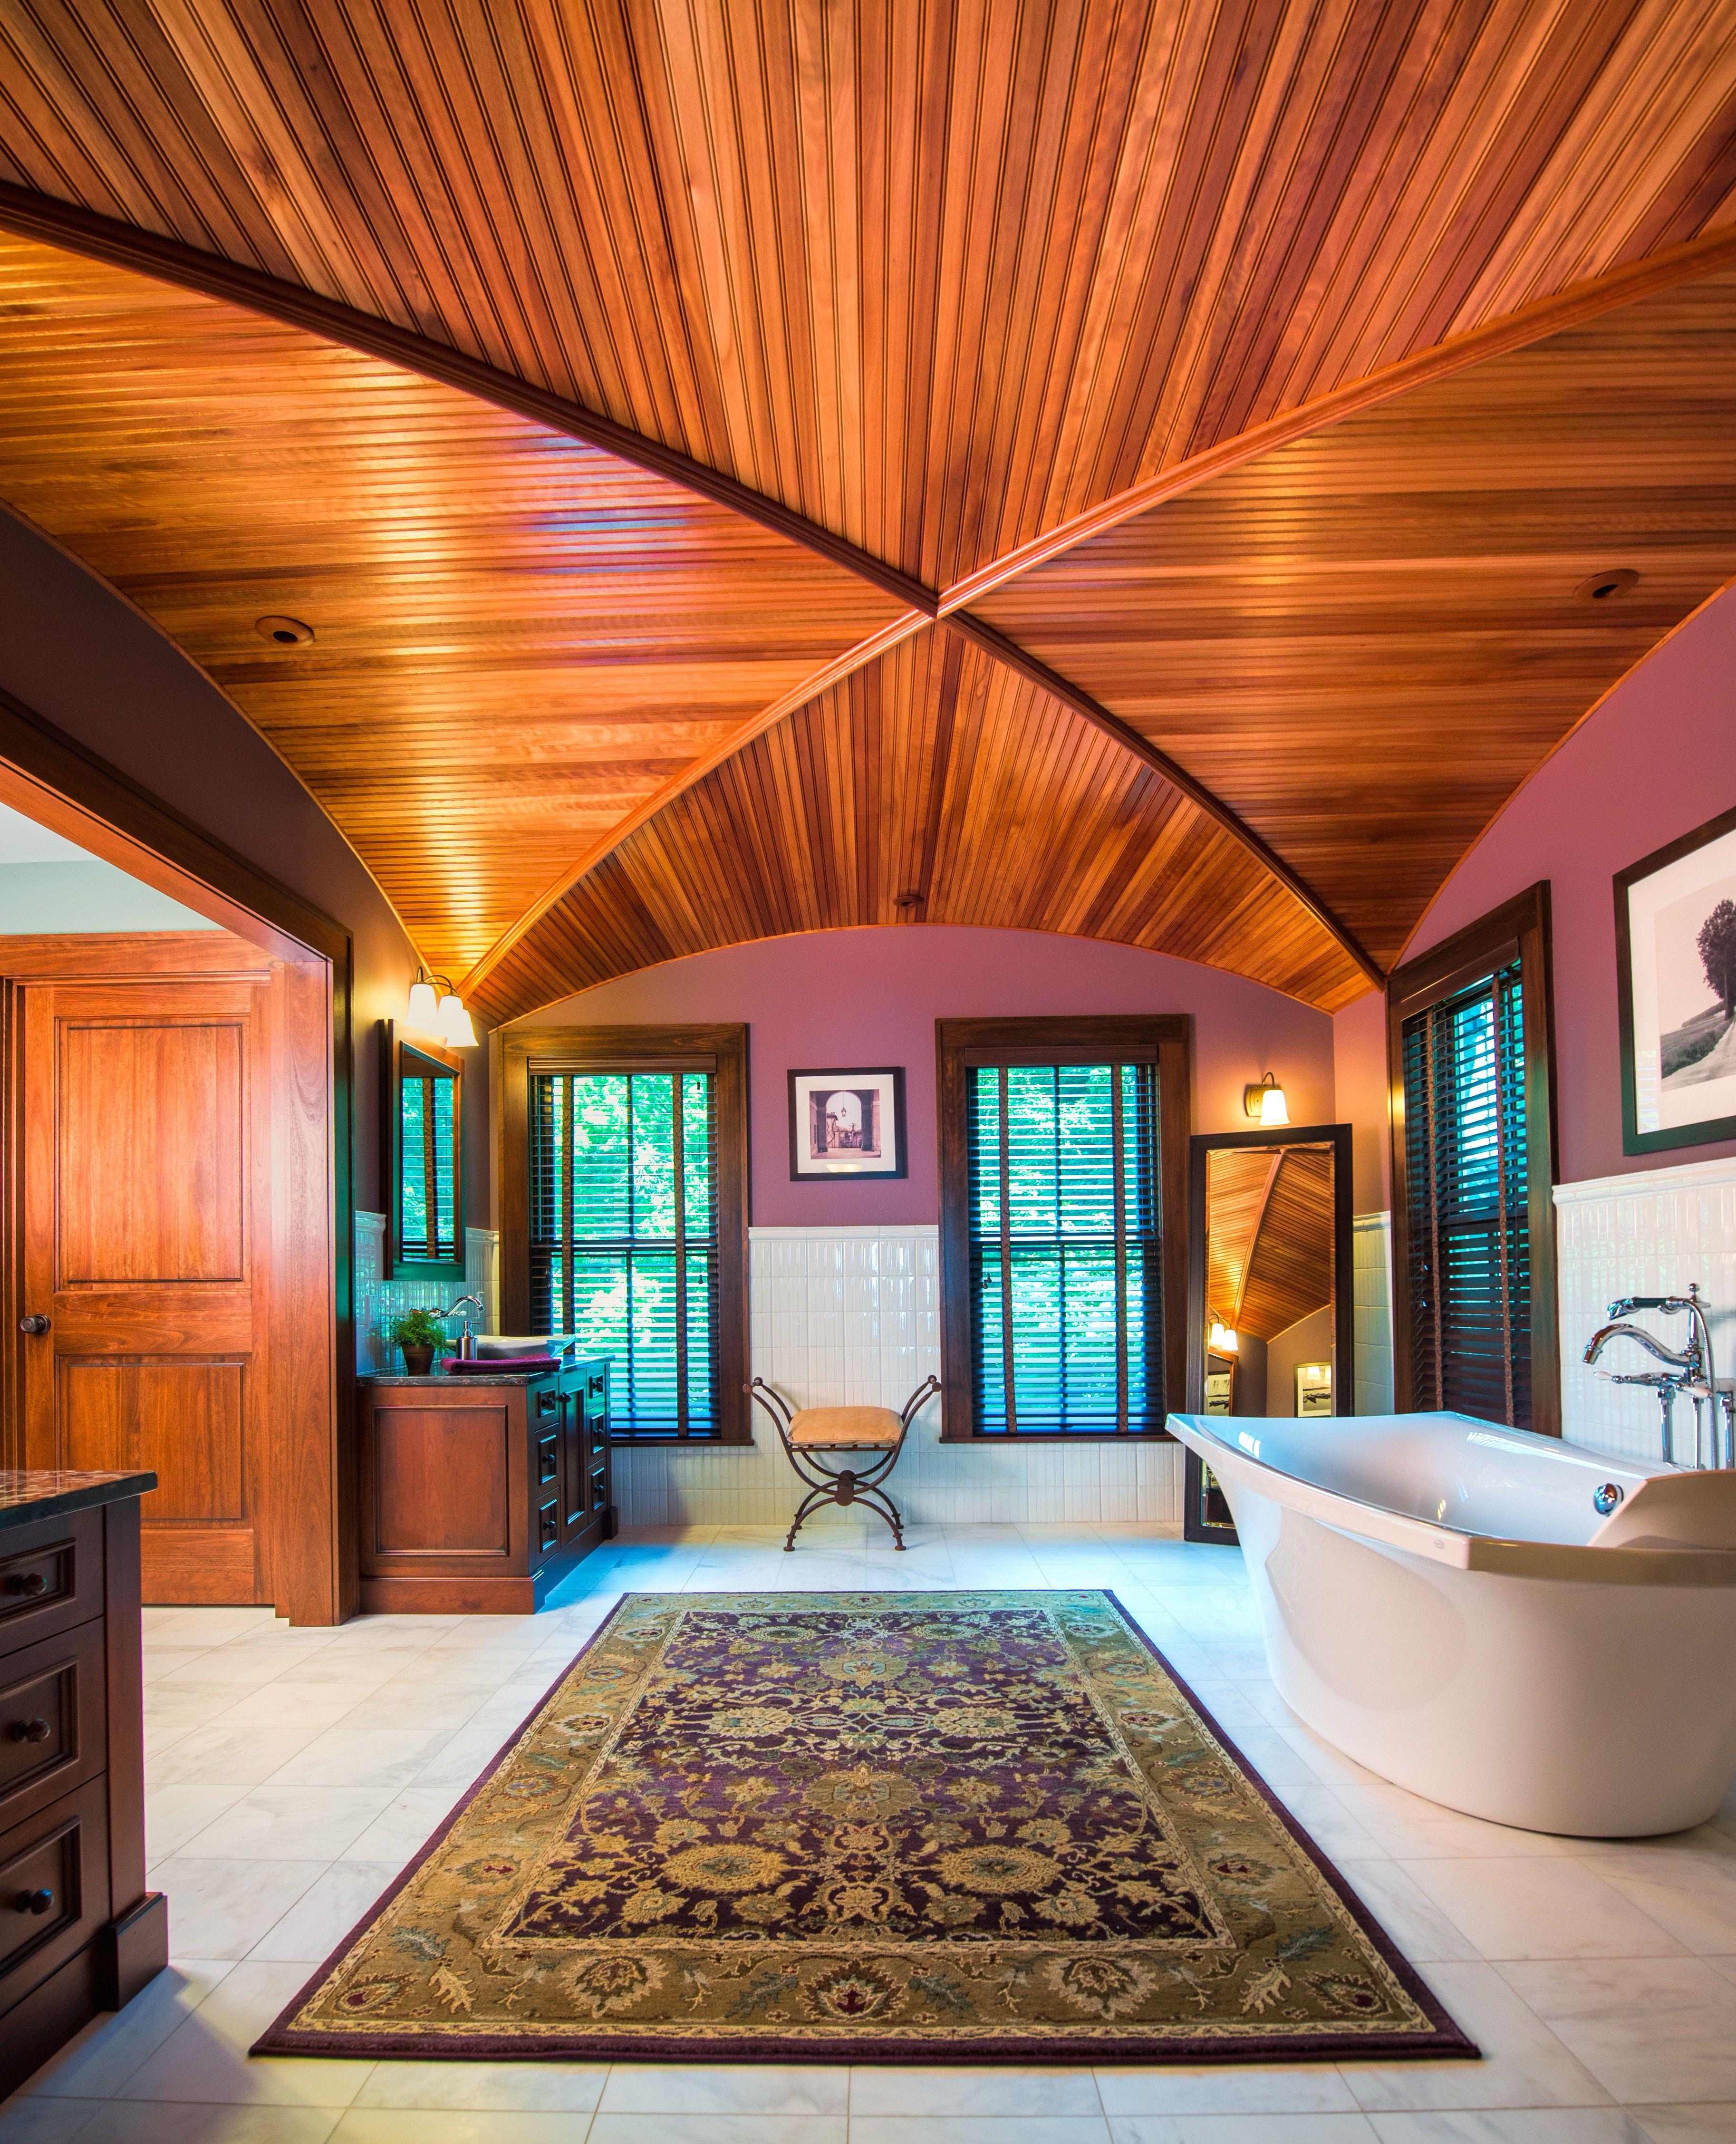 Master Bath And Wood Groin Vault Ceiling Ceiling Design Custom